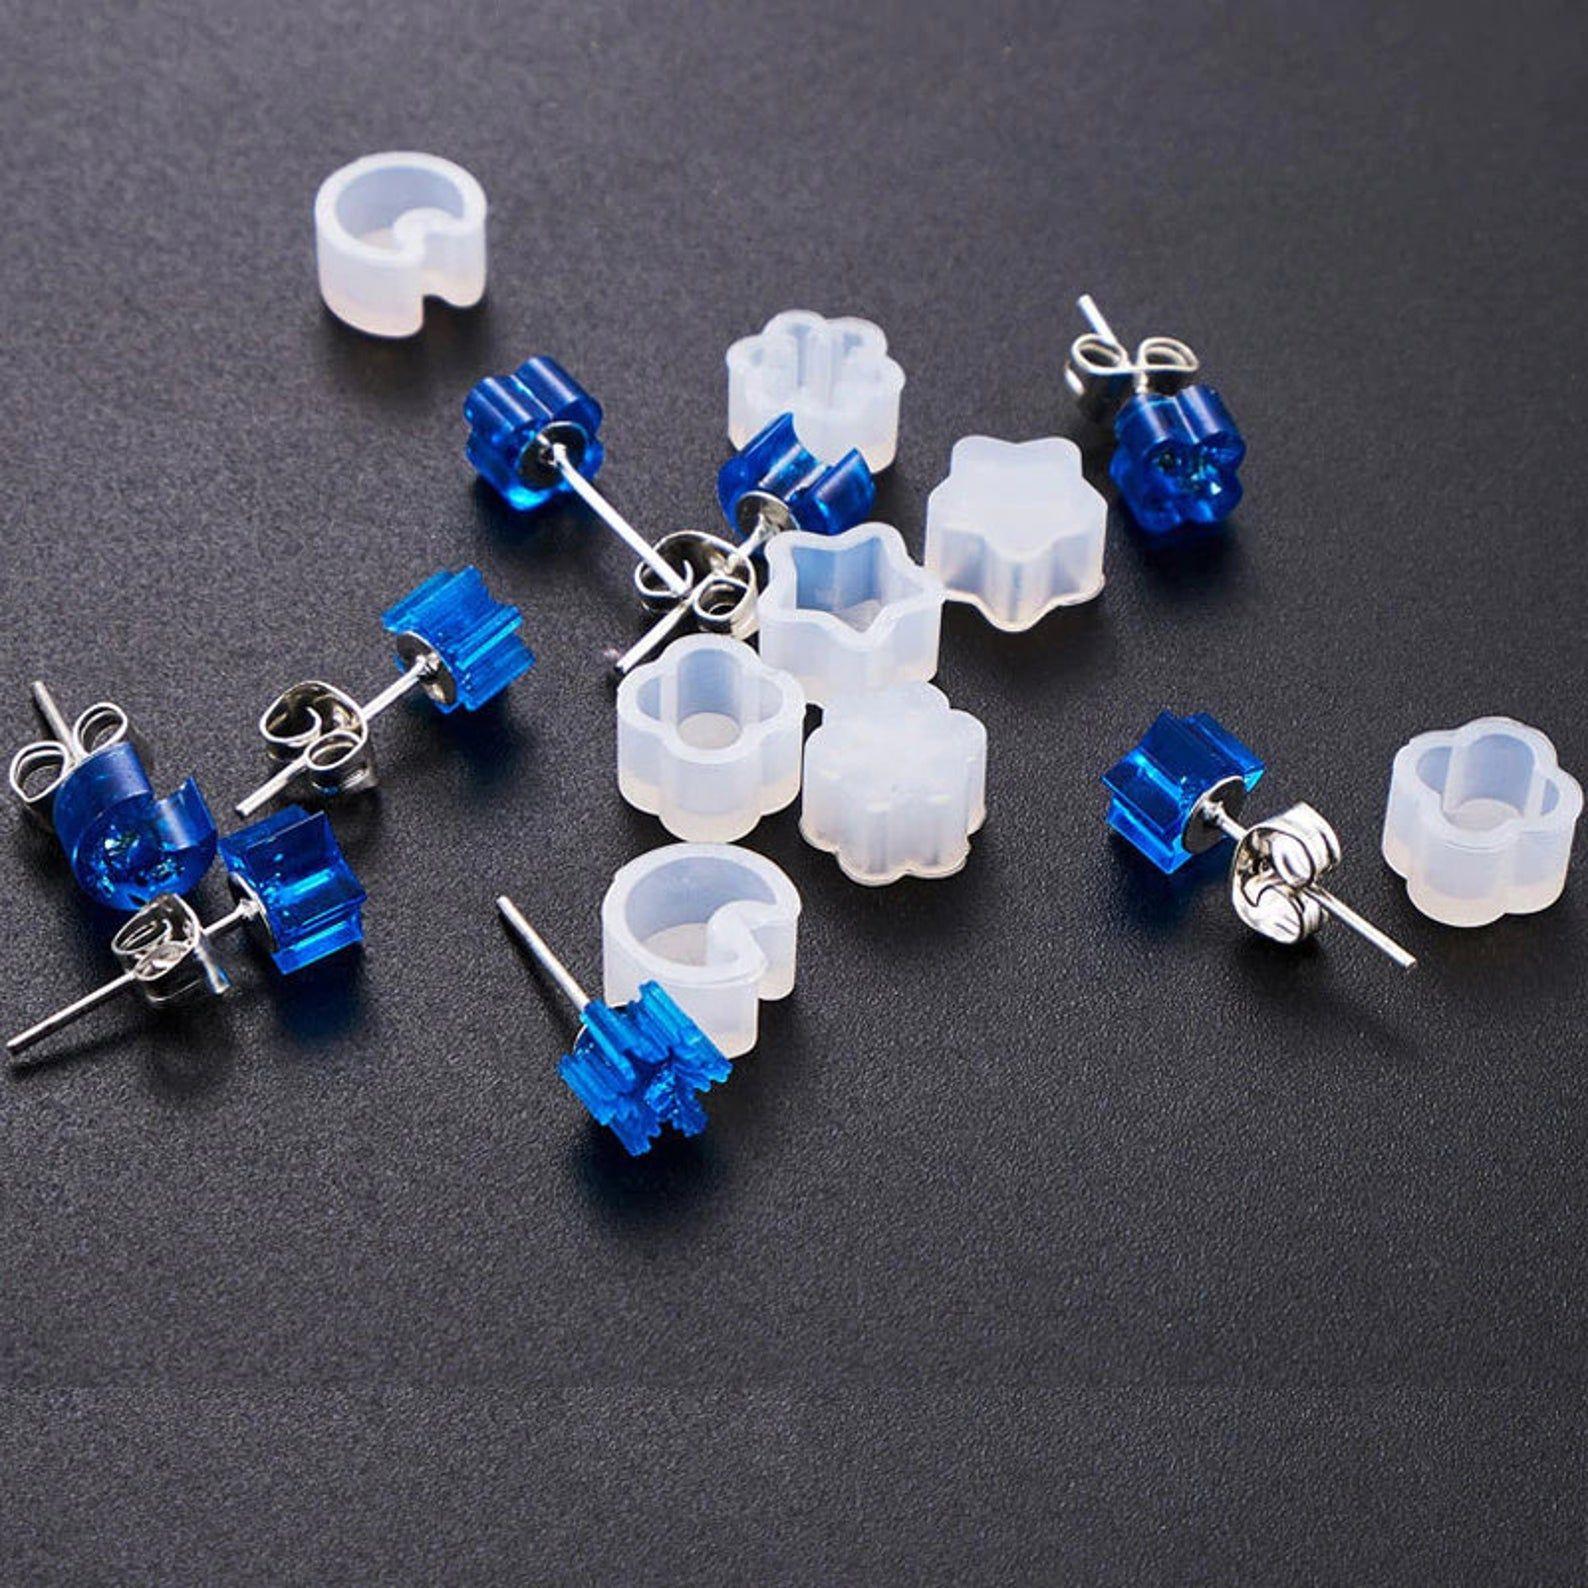 Snowflake Christmas Earrings Mold,Silicone Earring Silicone Mold Mold Supply Jewelry Mold